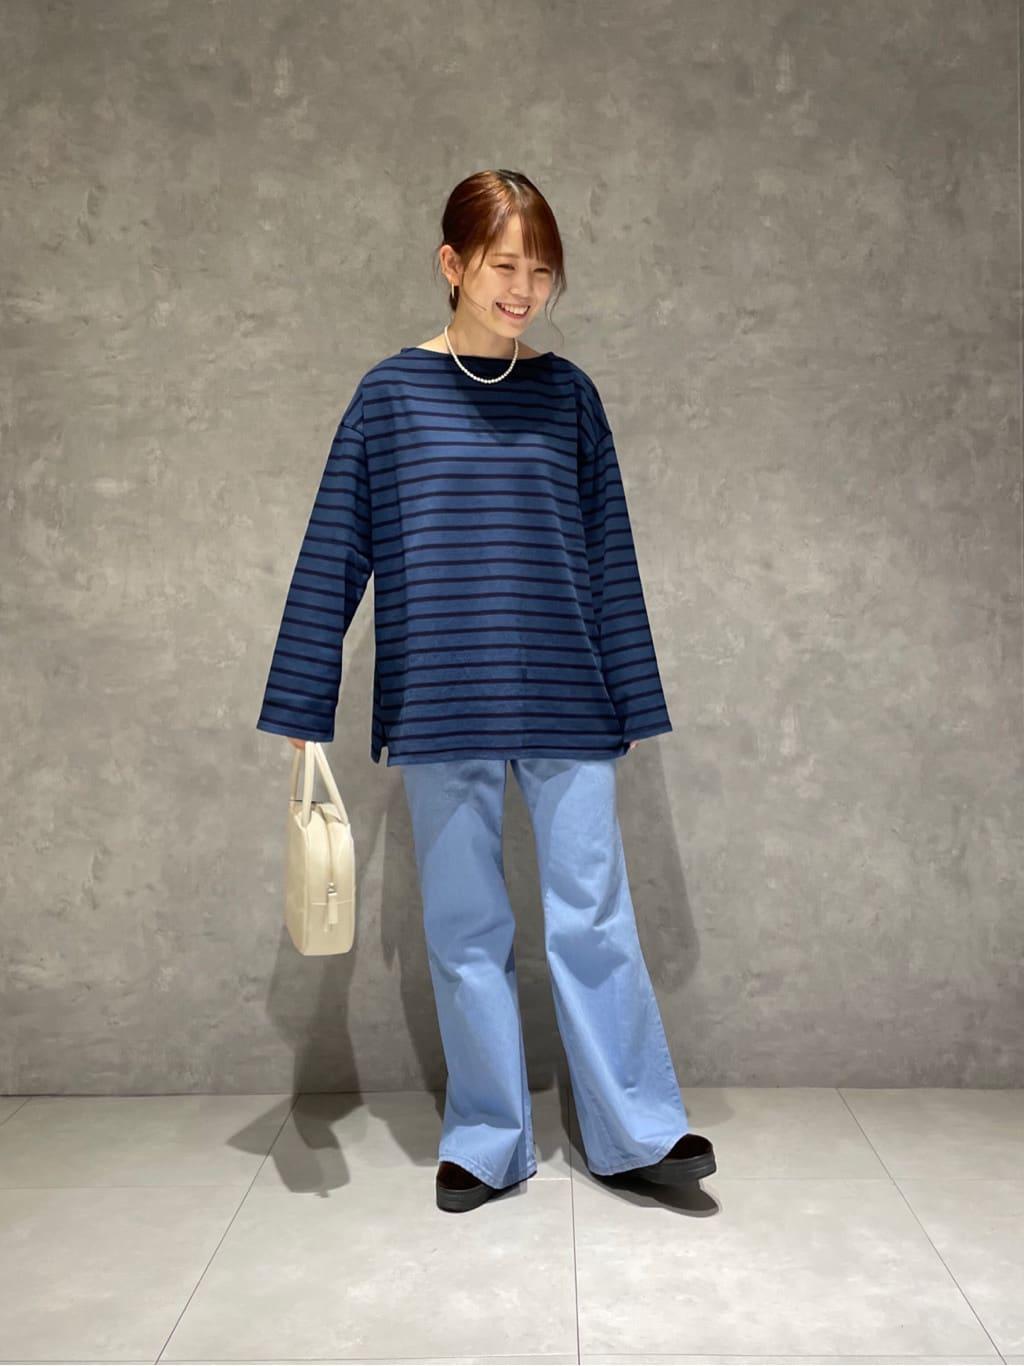 - CHILD WOMAN CHILD WOMAN , PAR ICI ルミネ池袋 身長:157cm 2021.08.23